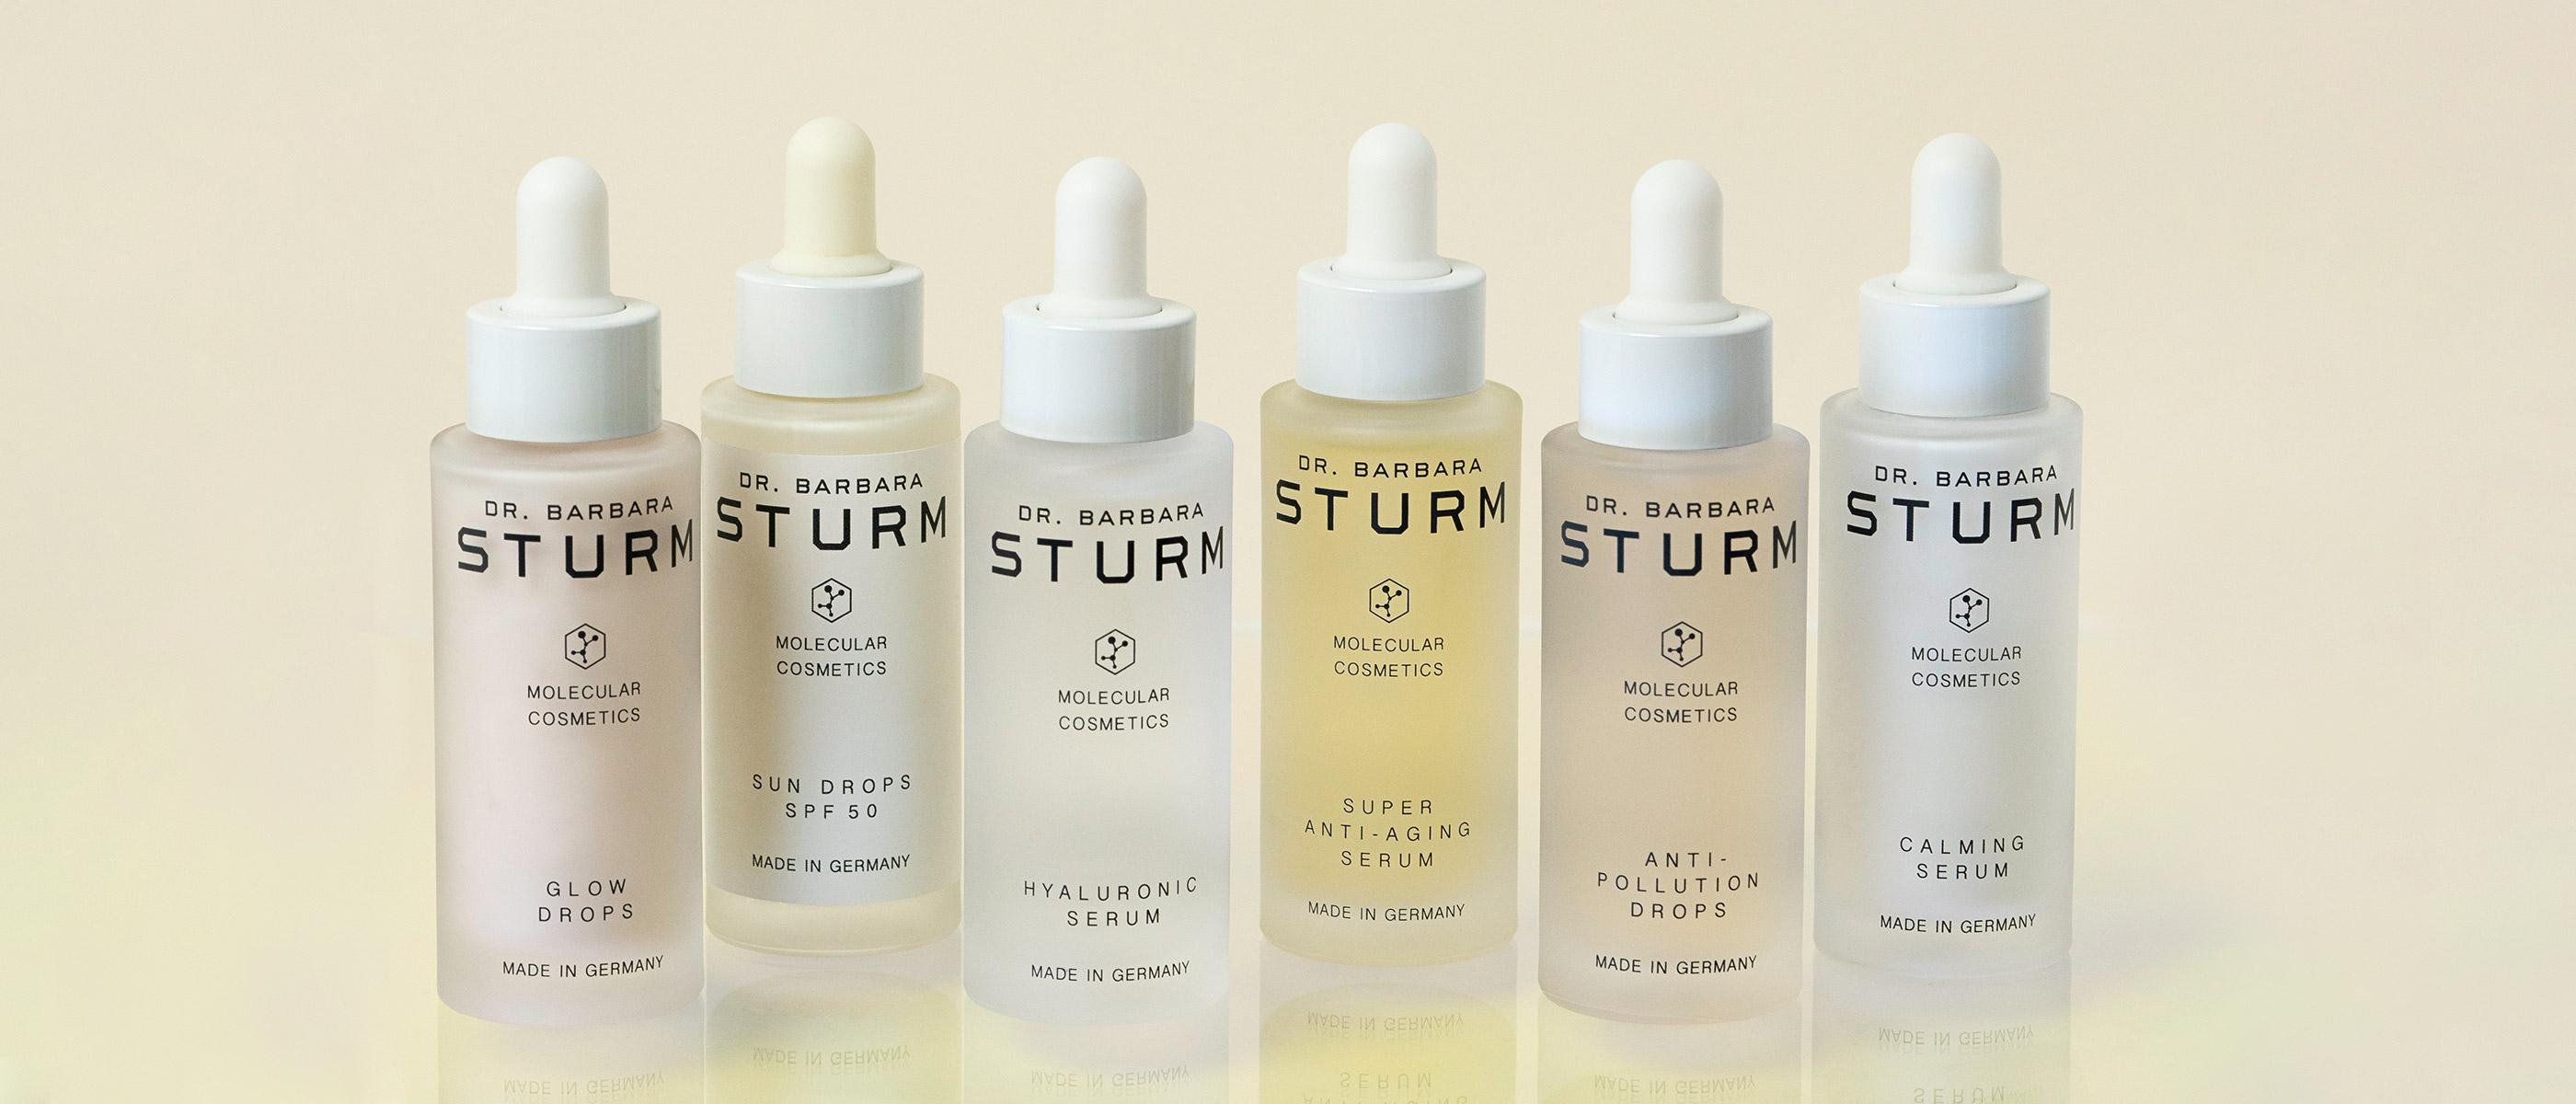 Skincity lanserer Dr. Barbara Sturm